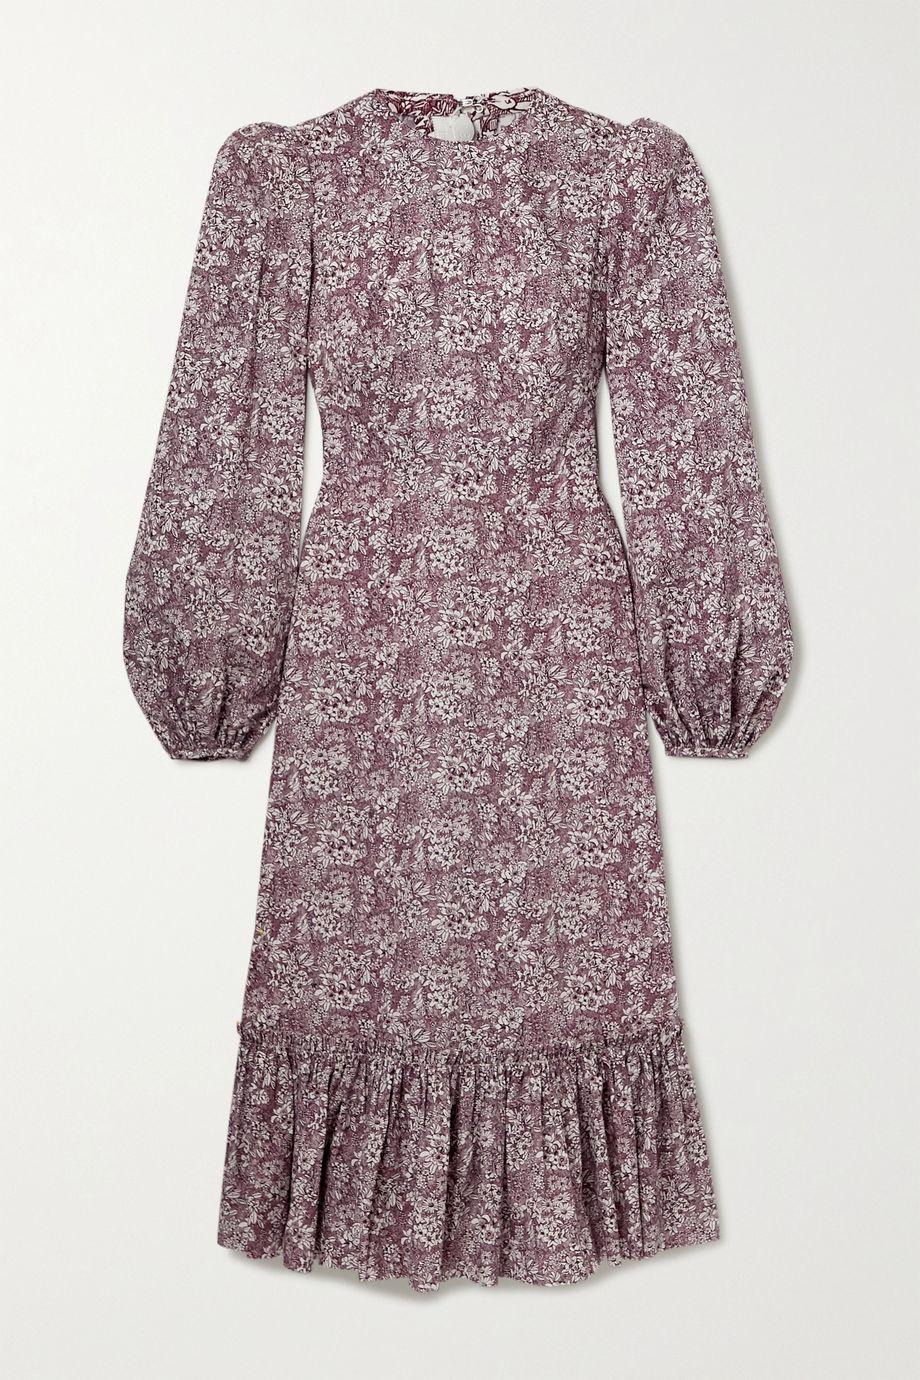 The Vampire's Wife Belle tiered floral-print cotton-poplin midi dress